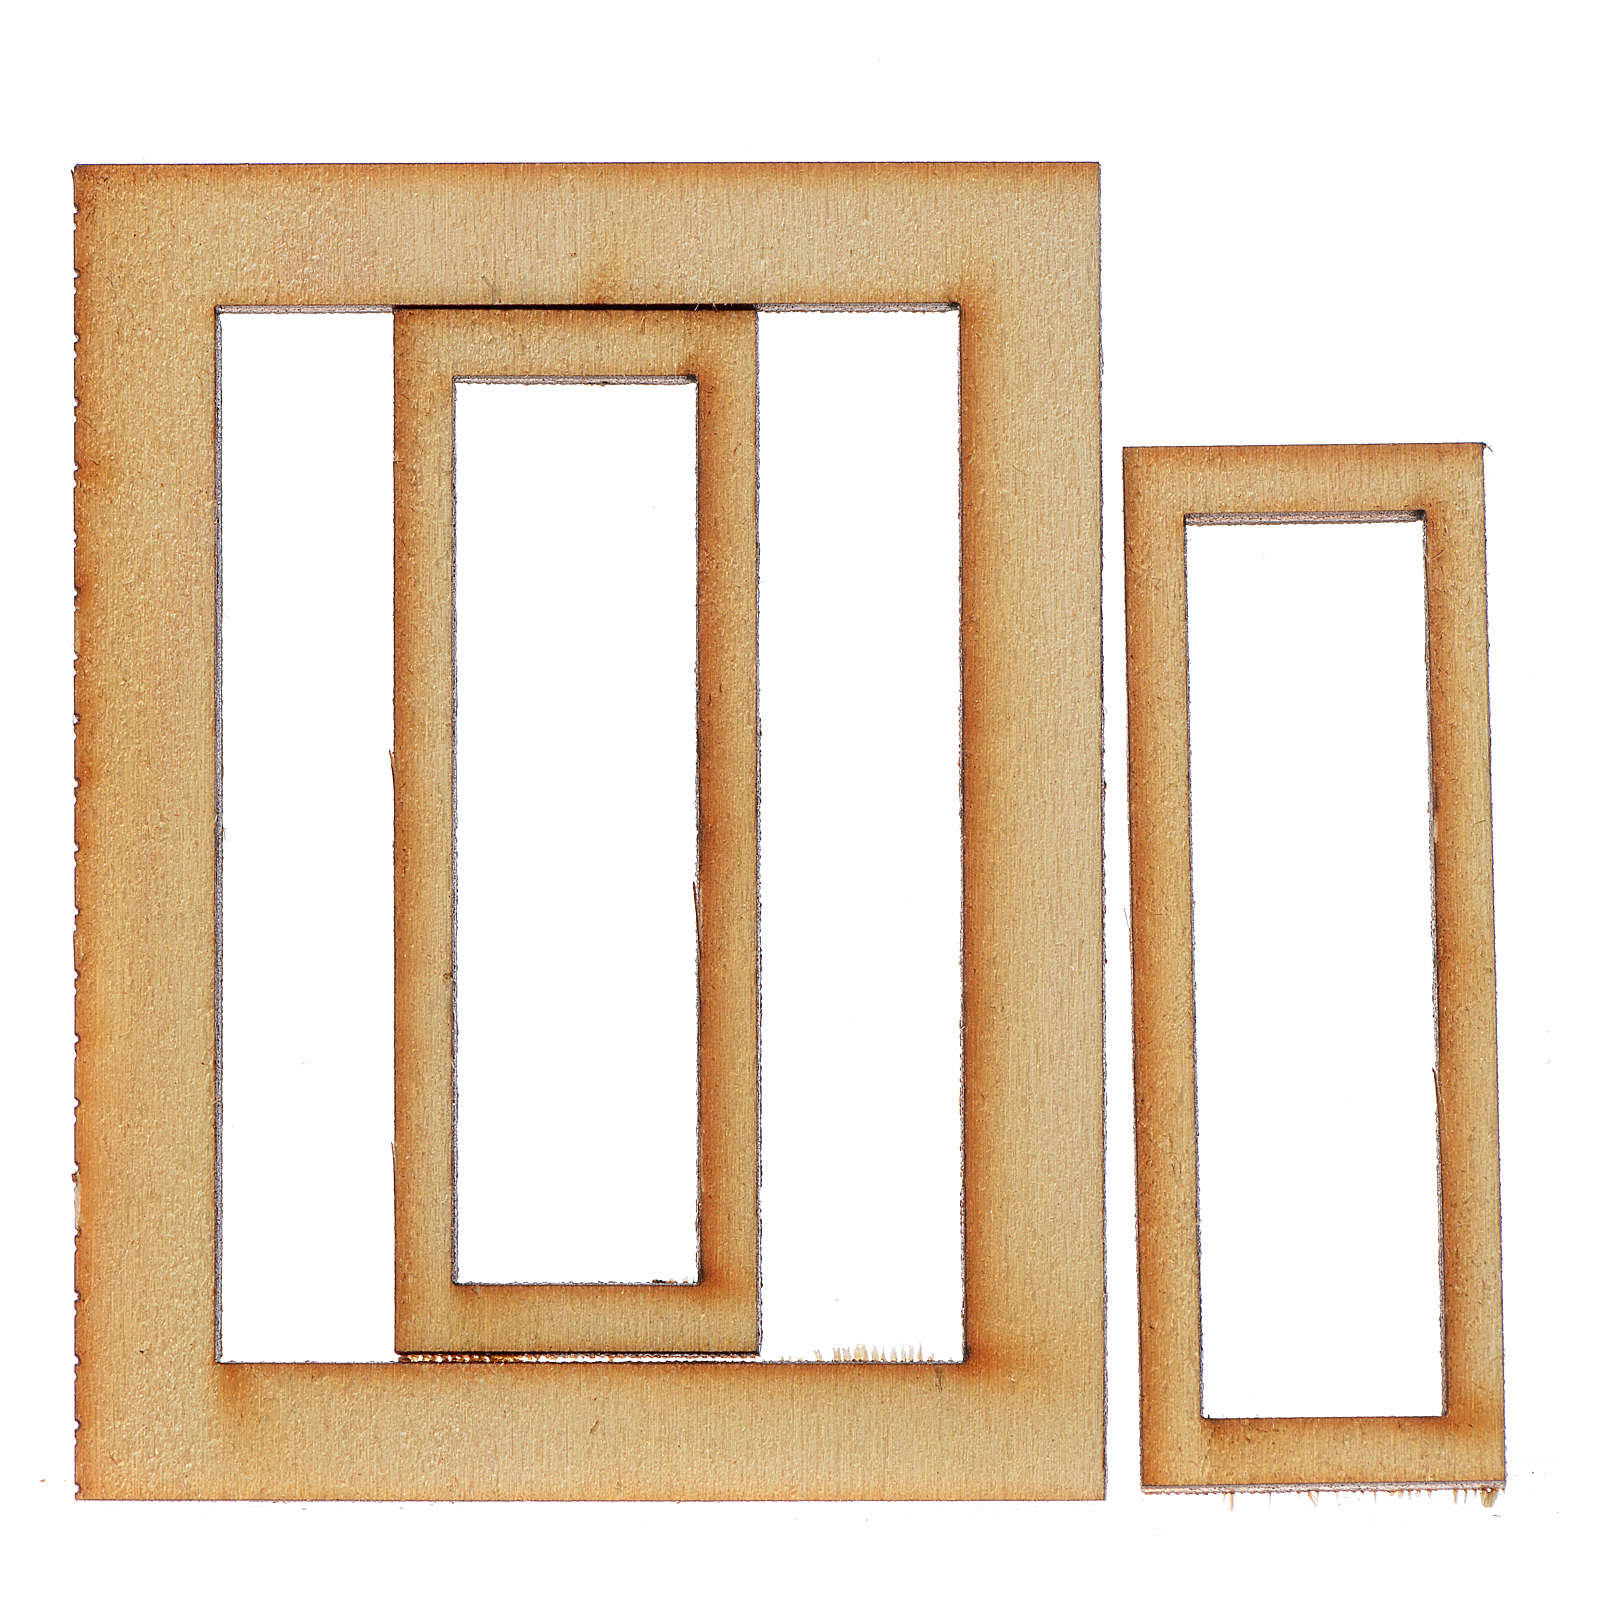 Nativity accessory, wooden frame 6.5x5cm 4